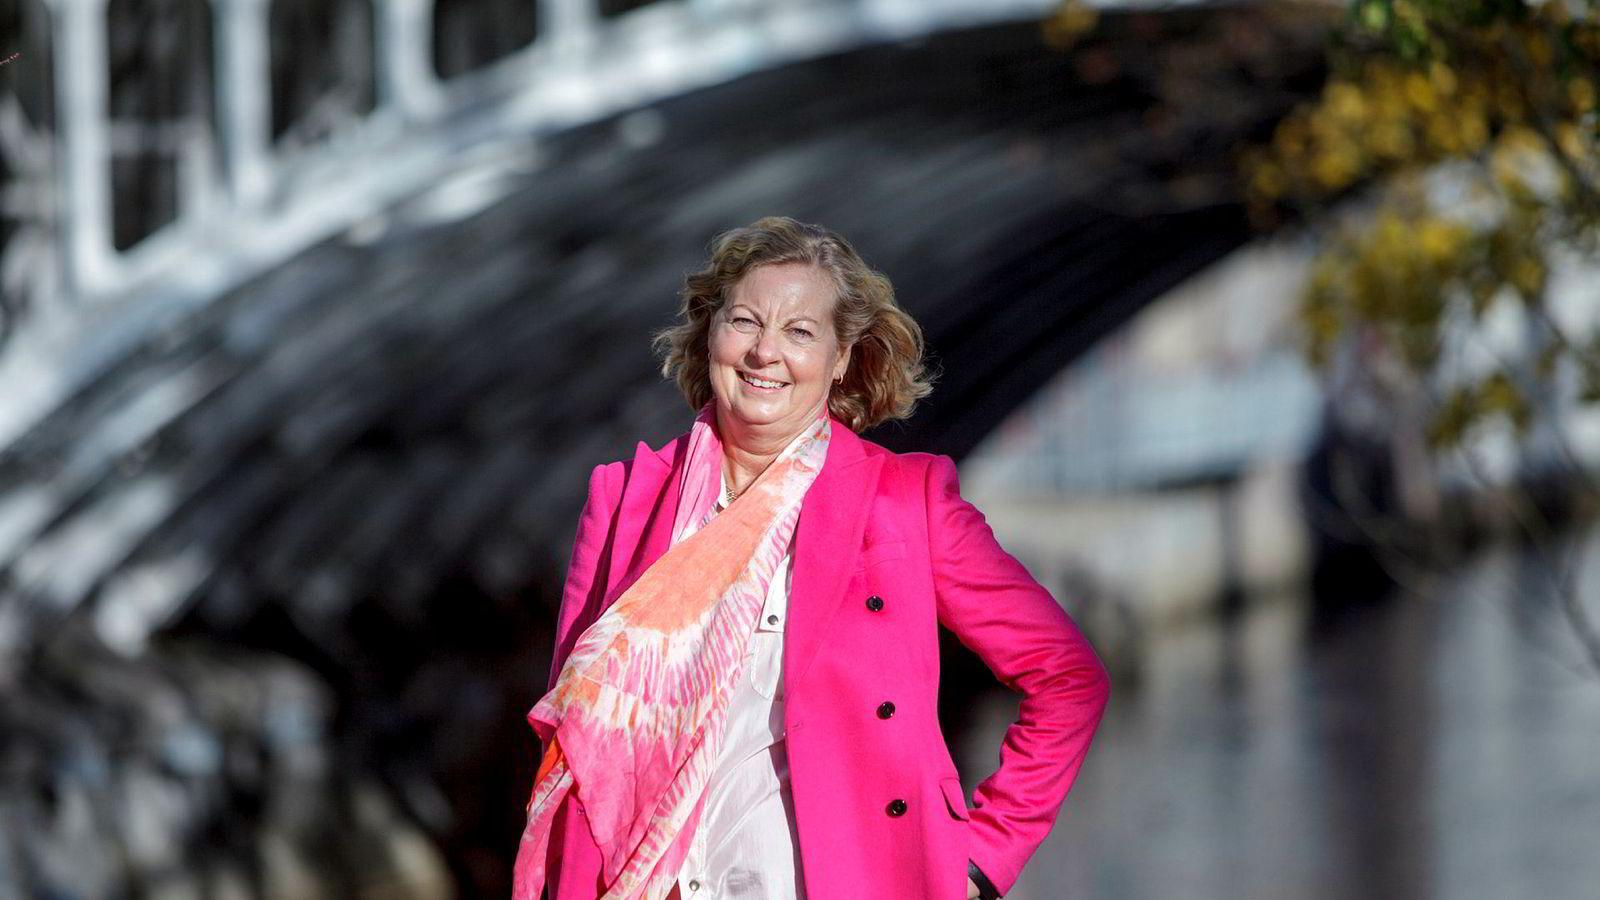 Tidligere konserndirektør i Telenor, Berit Svendsen, snakket om flere stormer hun har stått i på en konferanse torsdag.